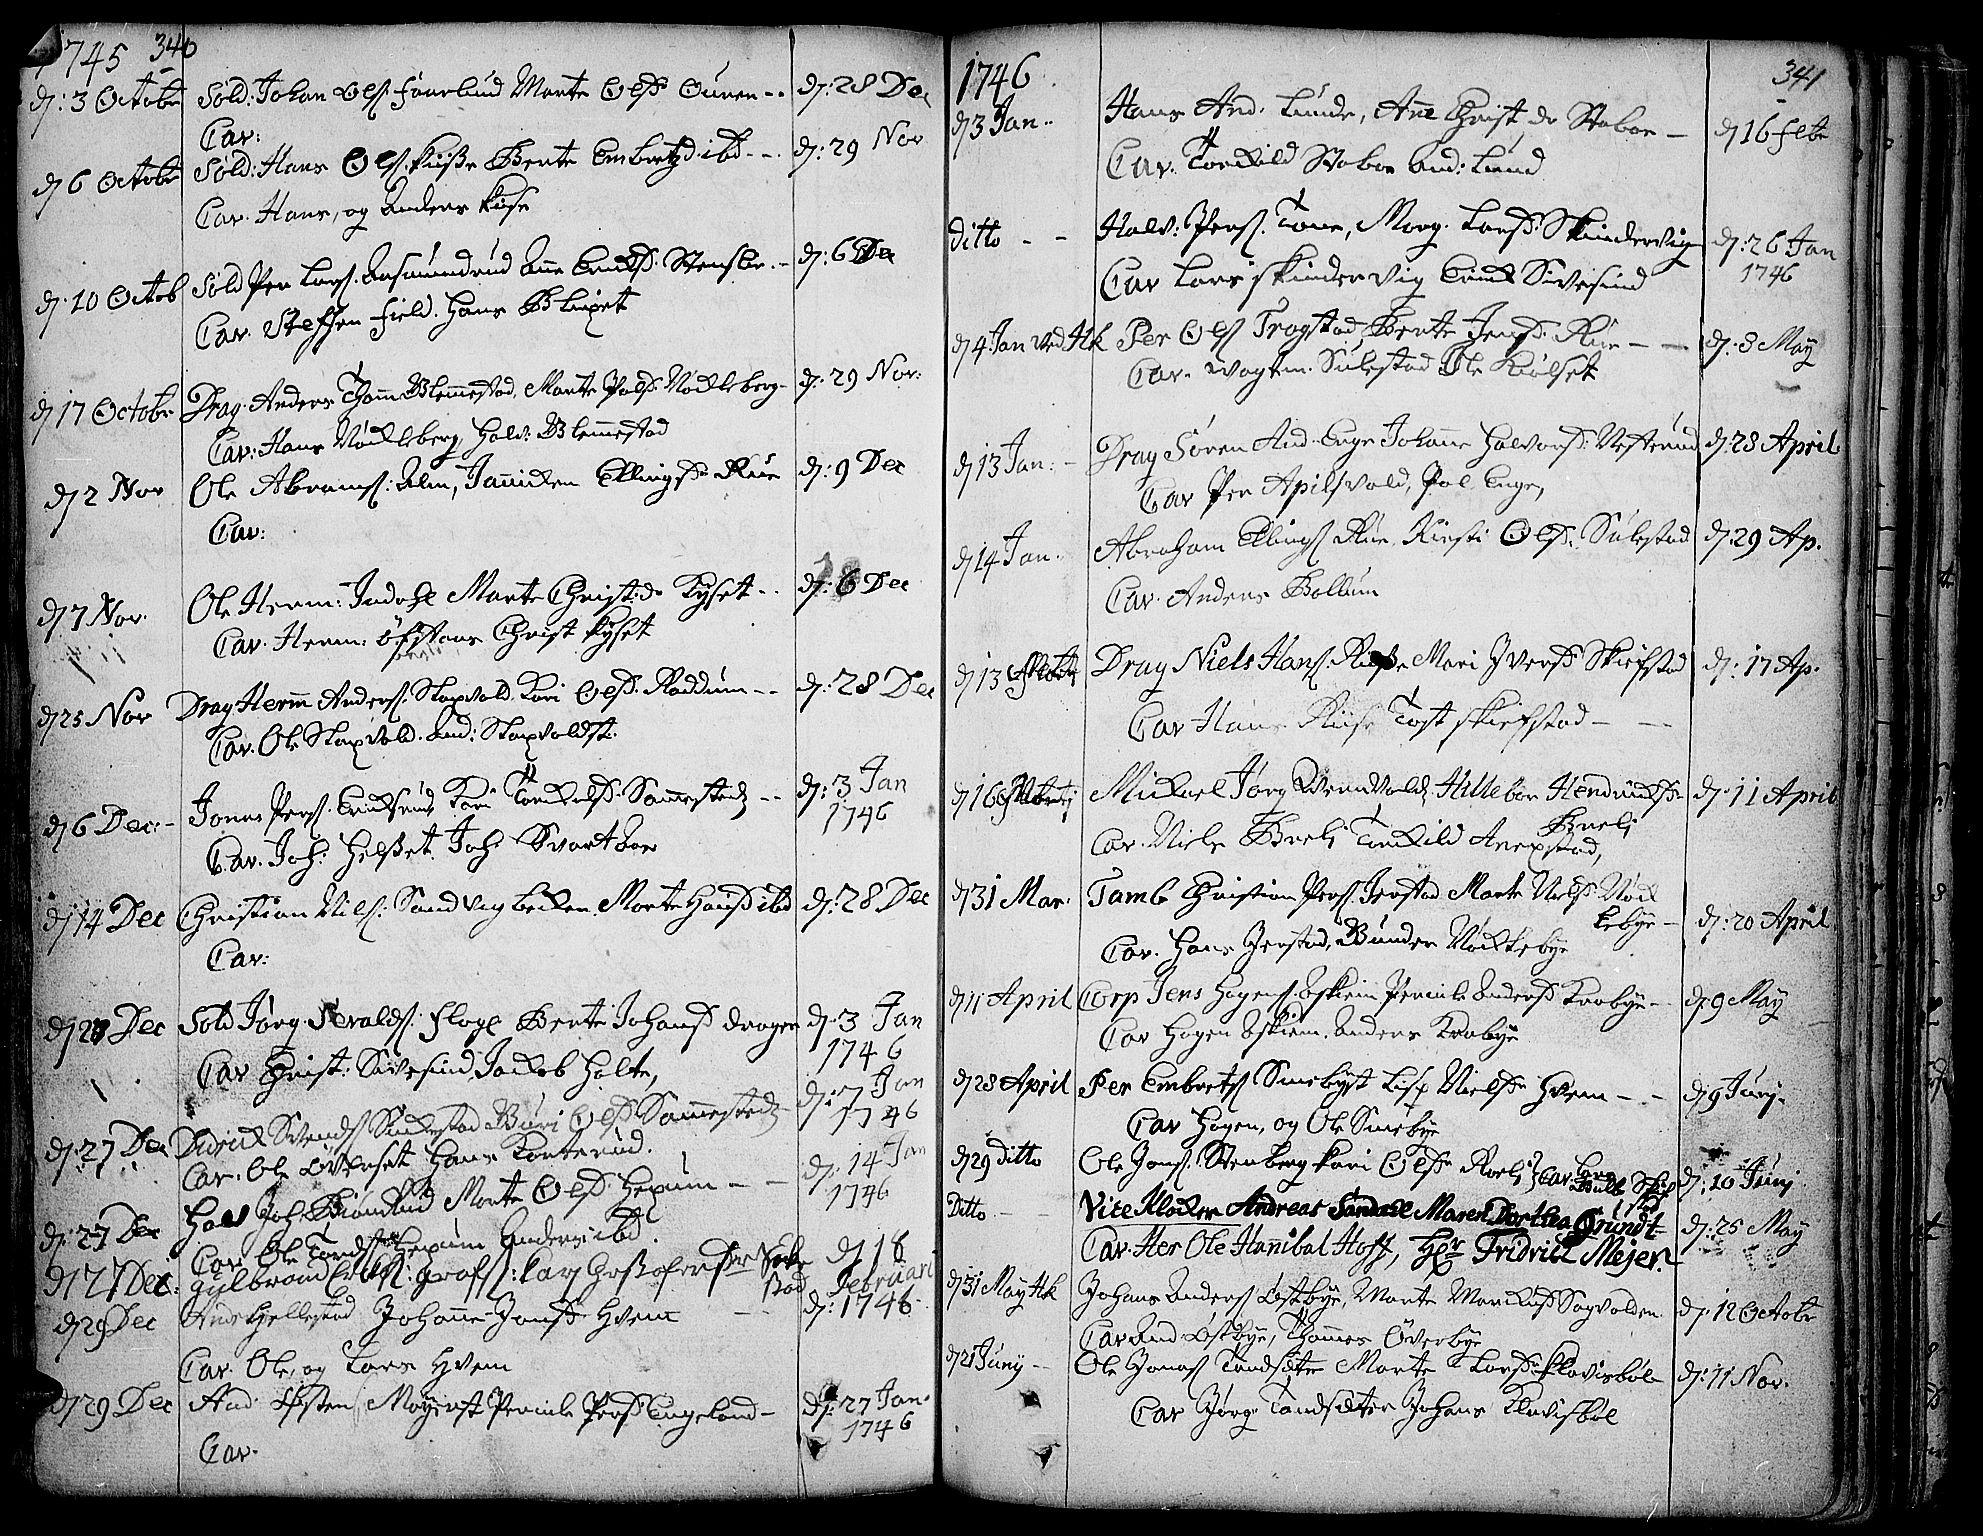 SAH, Toten prestekontor, Ministerialbok nr. 3, 1734-1751, s. 340-341